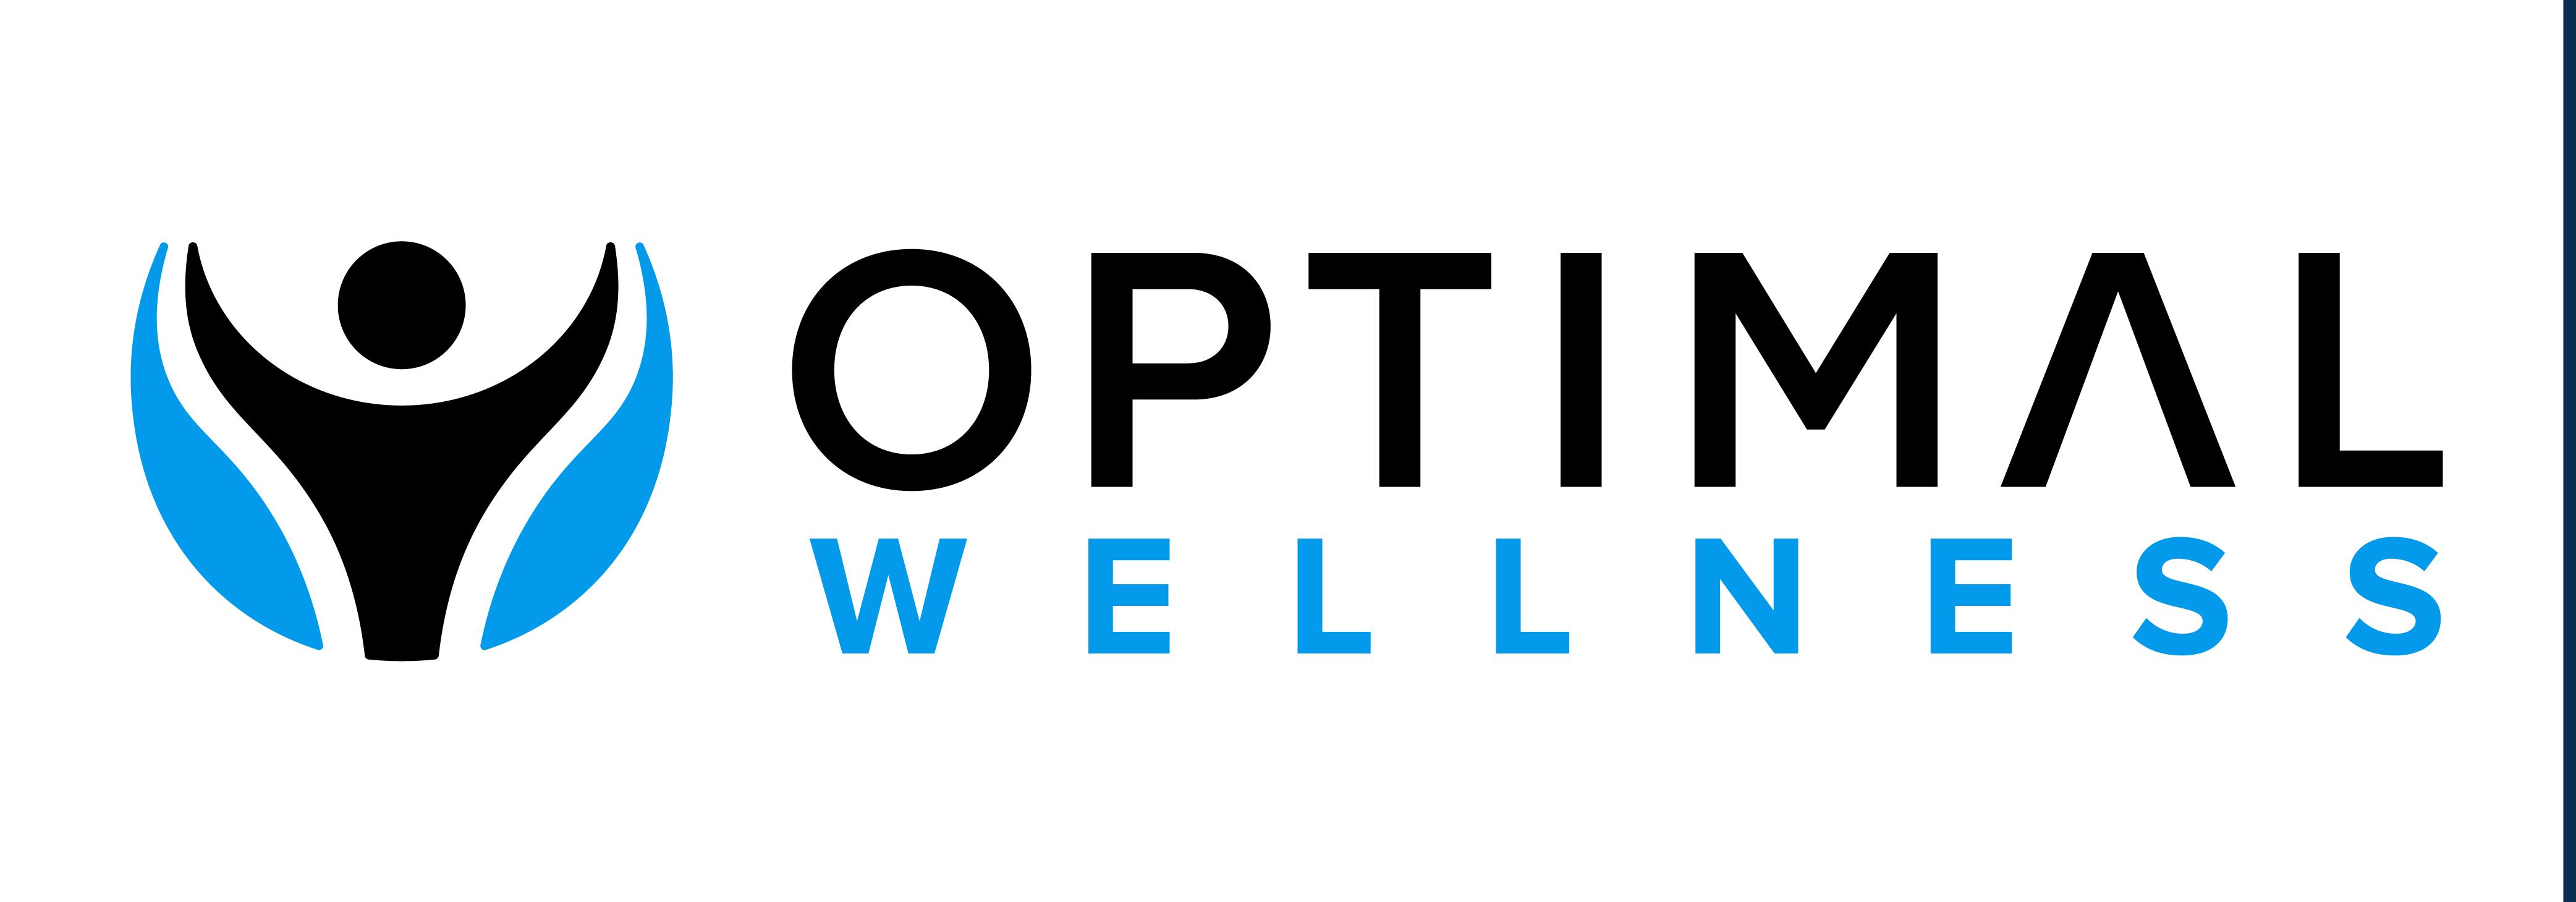 Optimal Wellness- Longmont